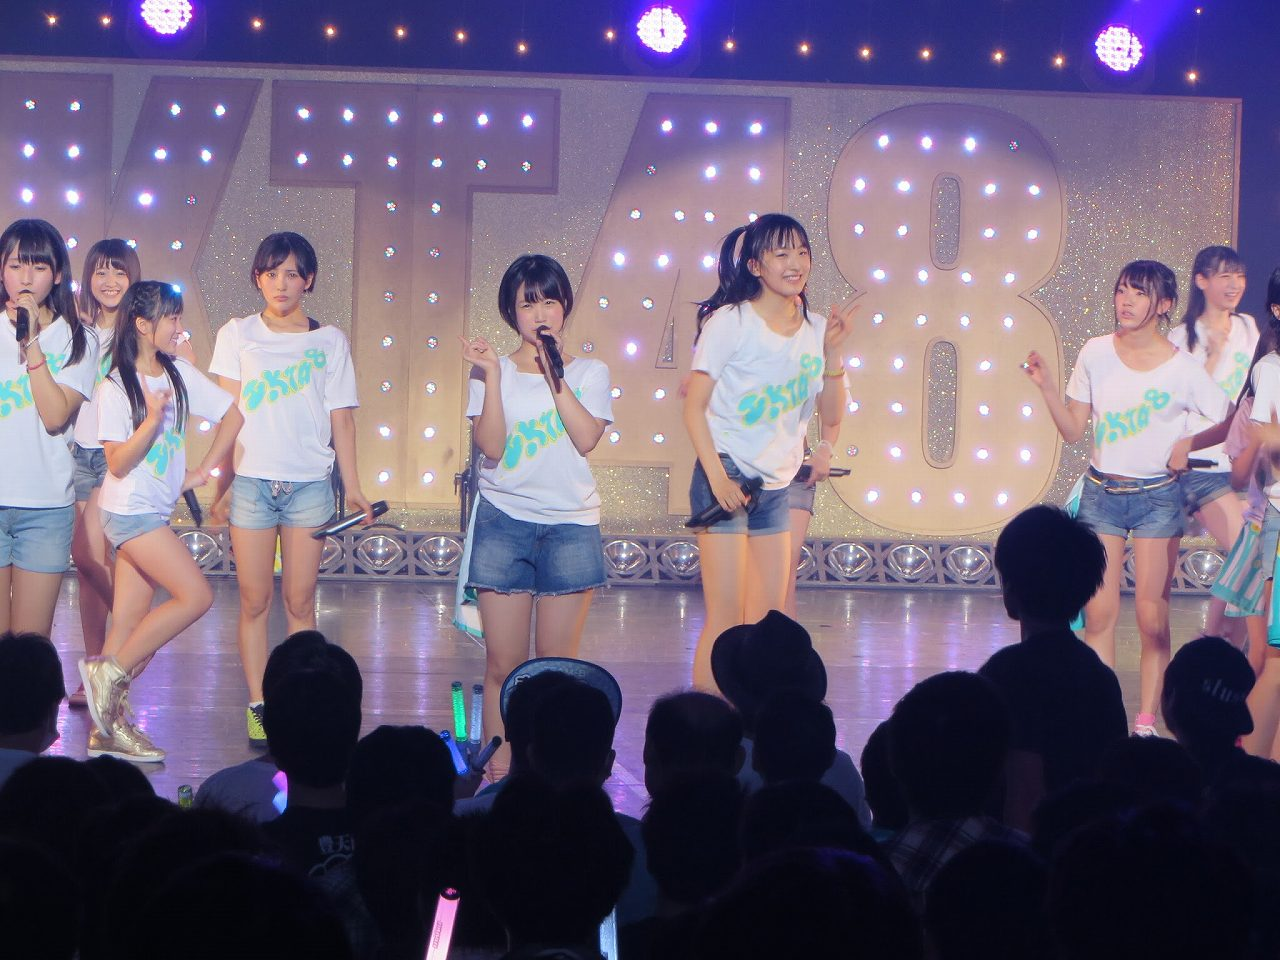 HKT48のステージでひとりだけデカパンを履いている朝長美桜、共演の指原莉乃と兒玉遥